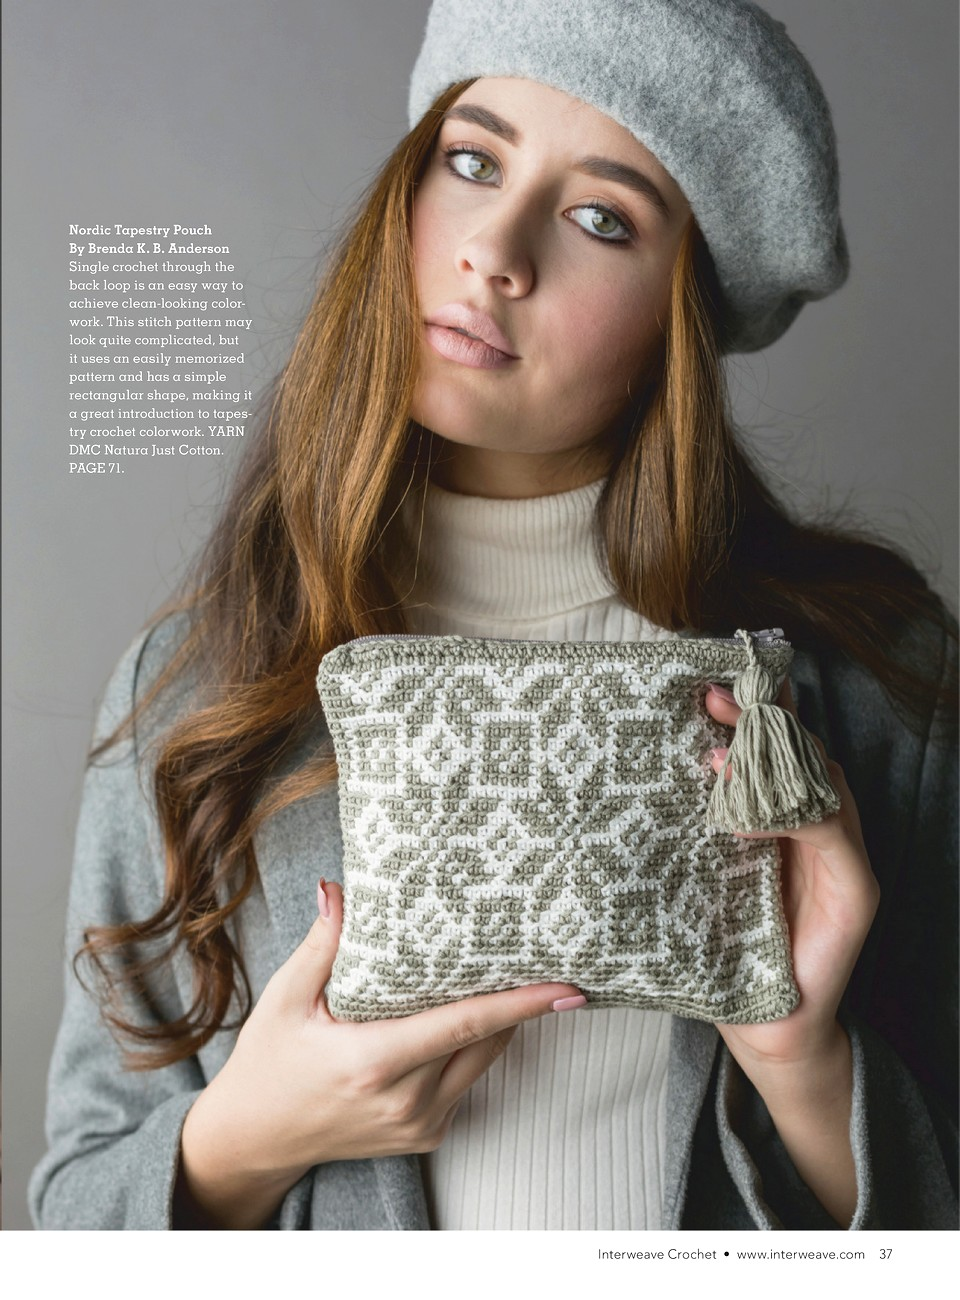 Interweave Crochet Winter 2019-38